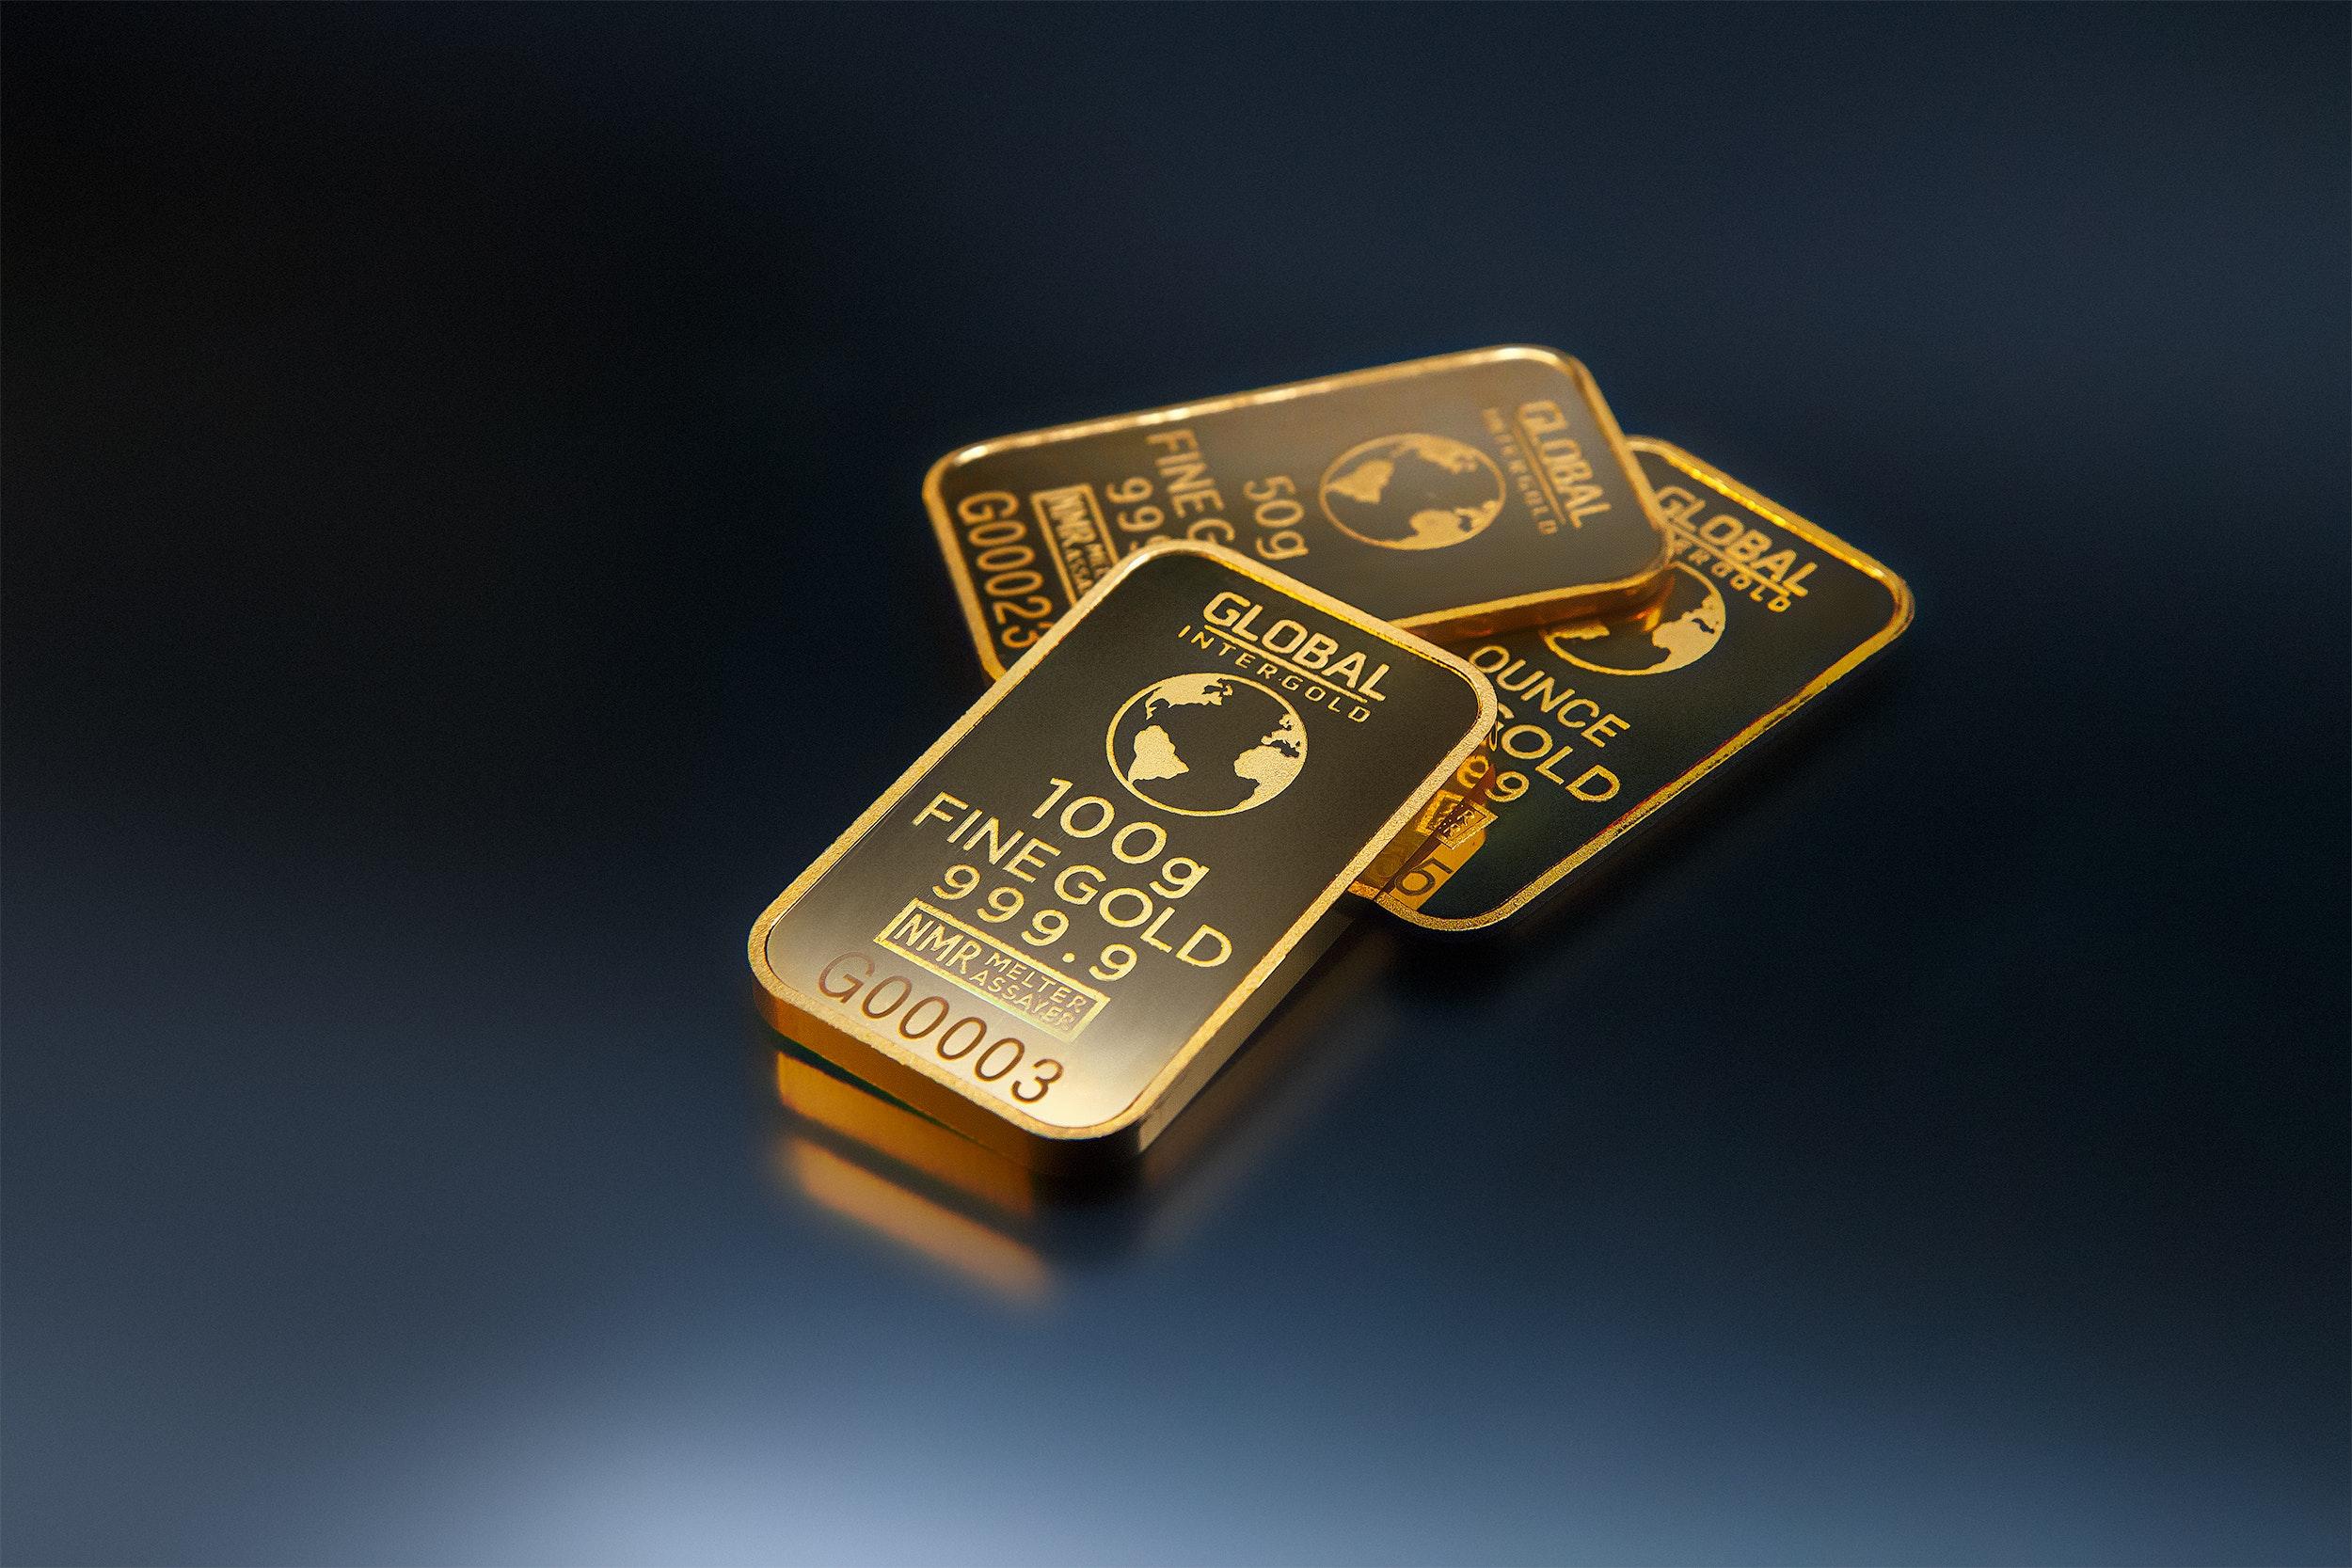 three-gold-bars-against-dark-background-321452.jpg